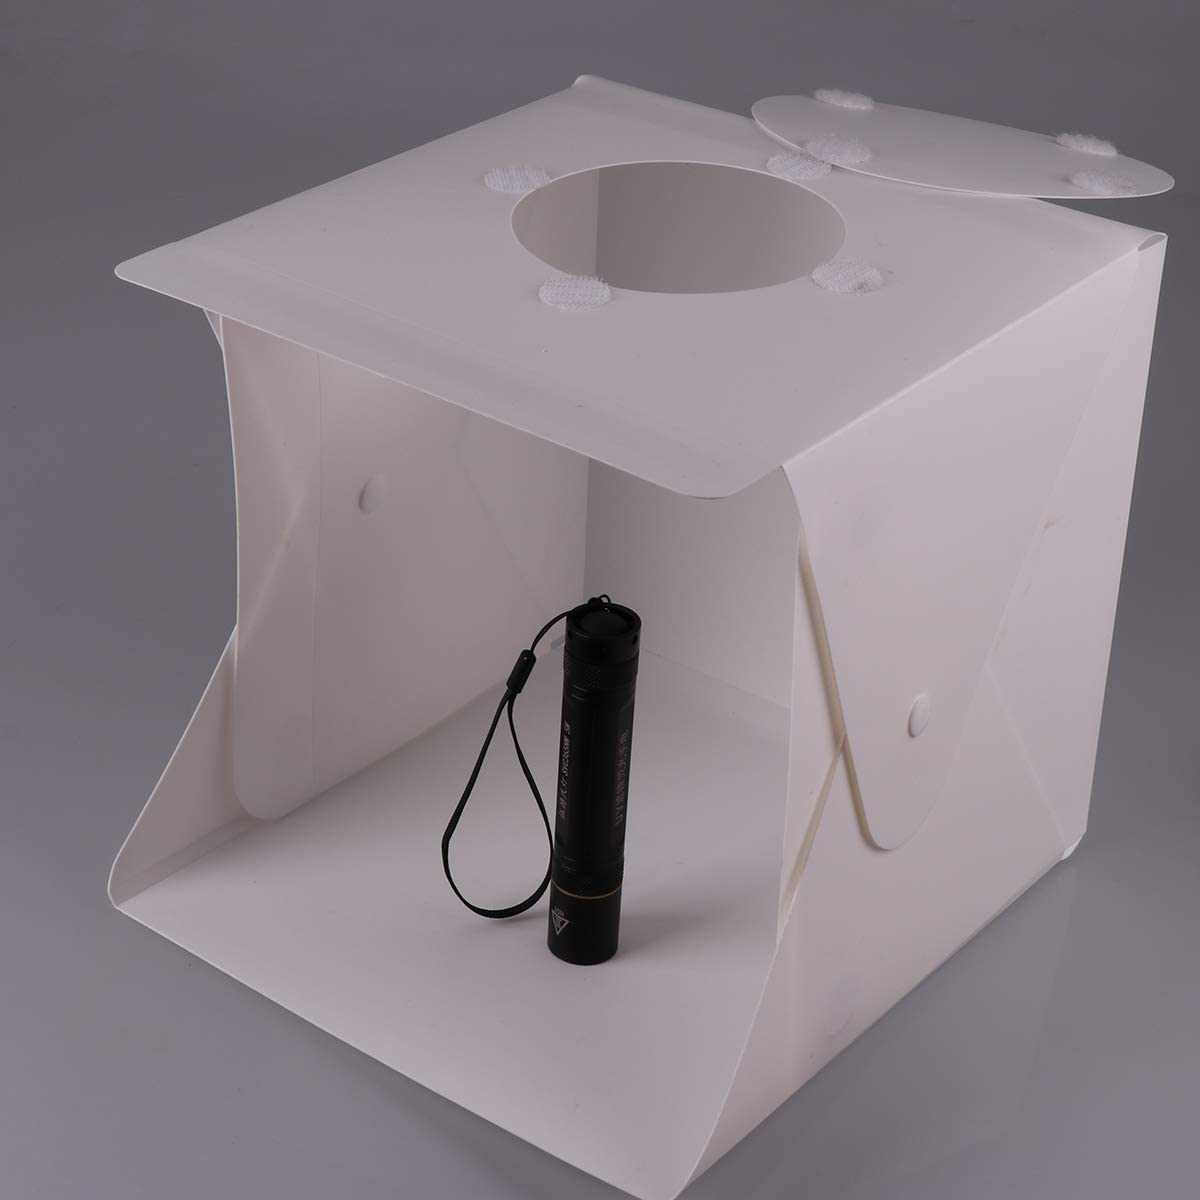 OhhGo Mini Folding Light Box Photography Photo Studio Box with Dual LED Strip Lights 6 Backdrops